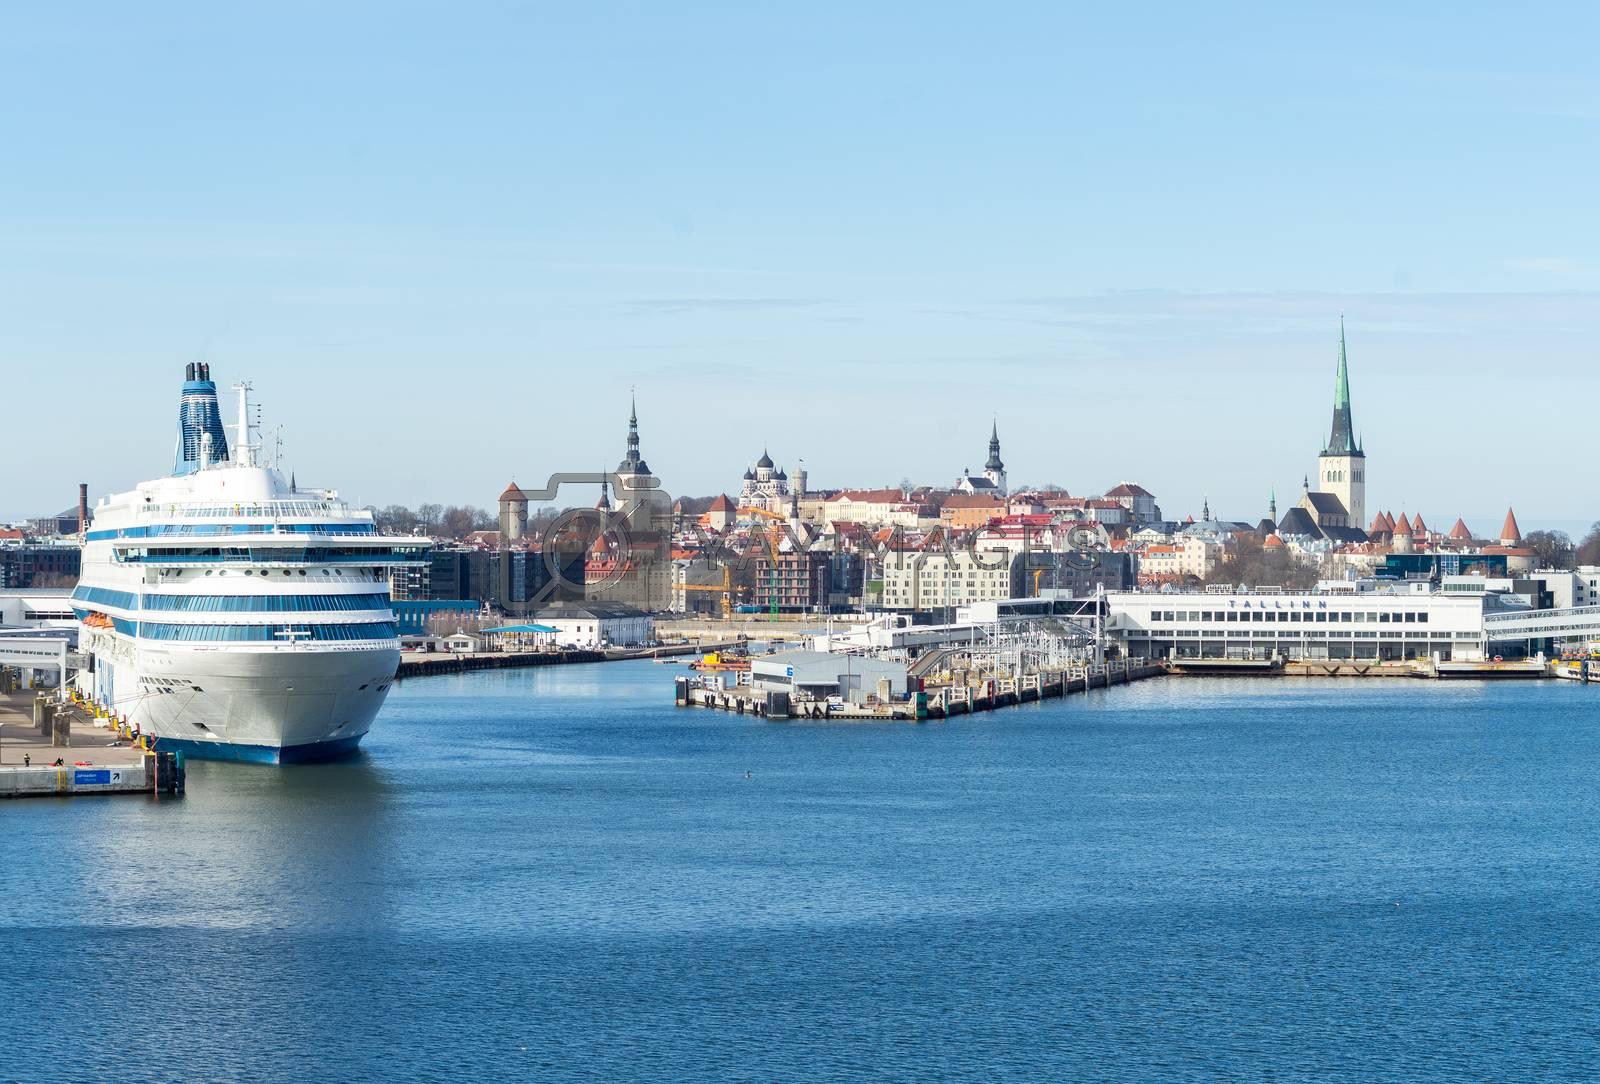 23 April 2019, Tallinn, Estonia. High-speed passenger and car ferry of the Estonian shipping concern Tallink Silja Europa in the port of Tallinn.